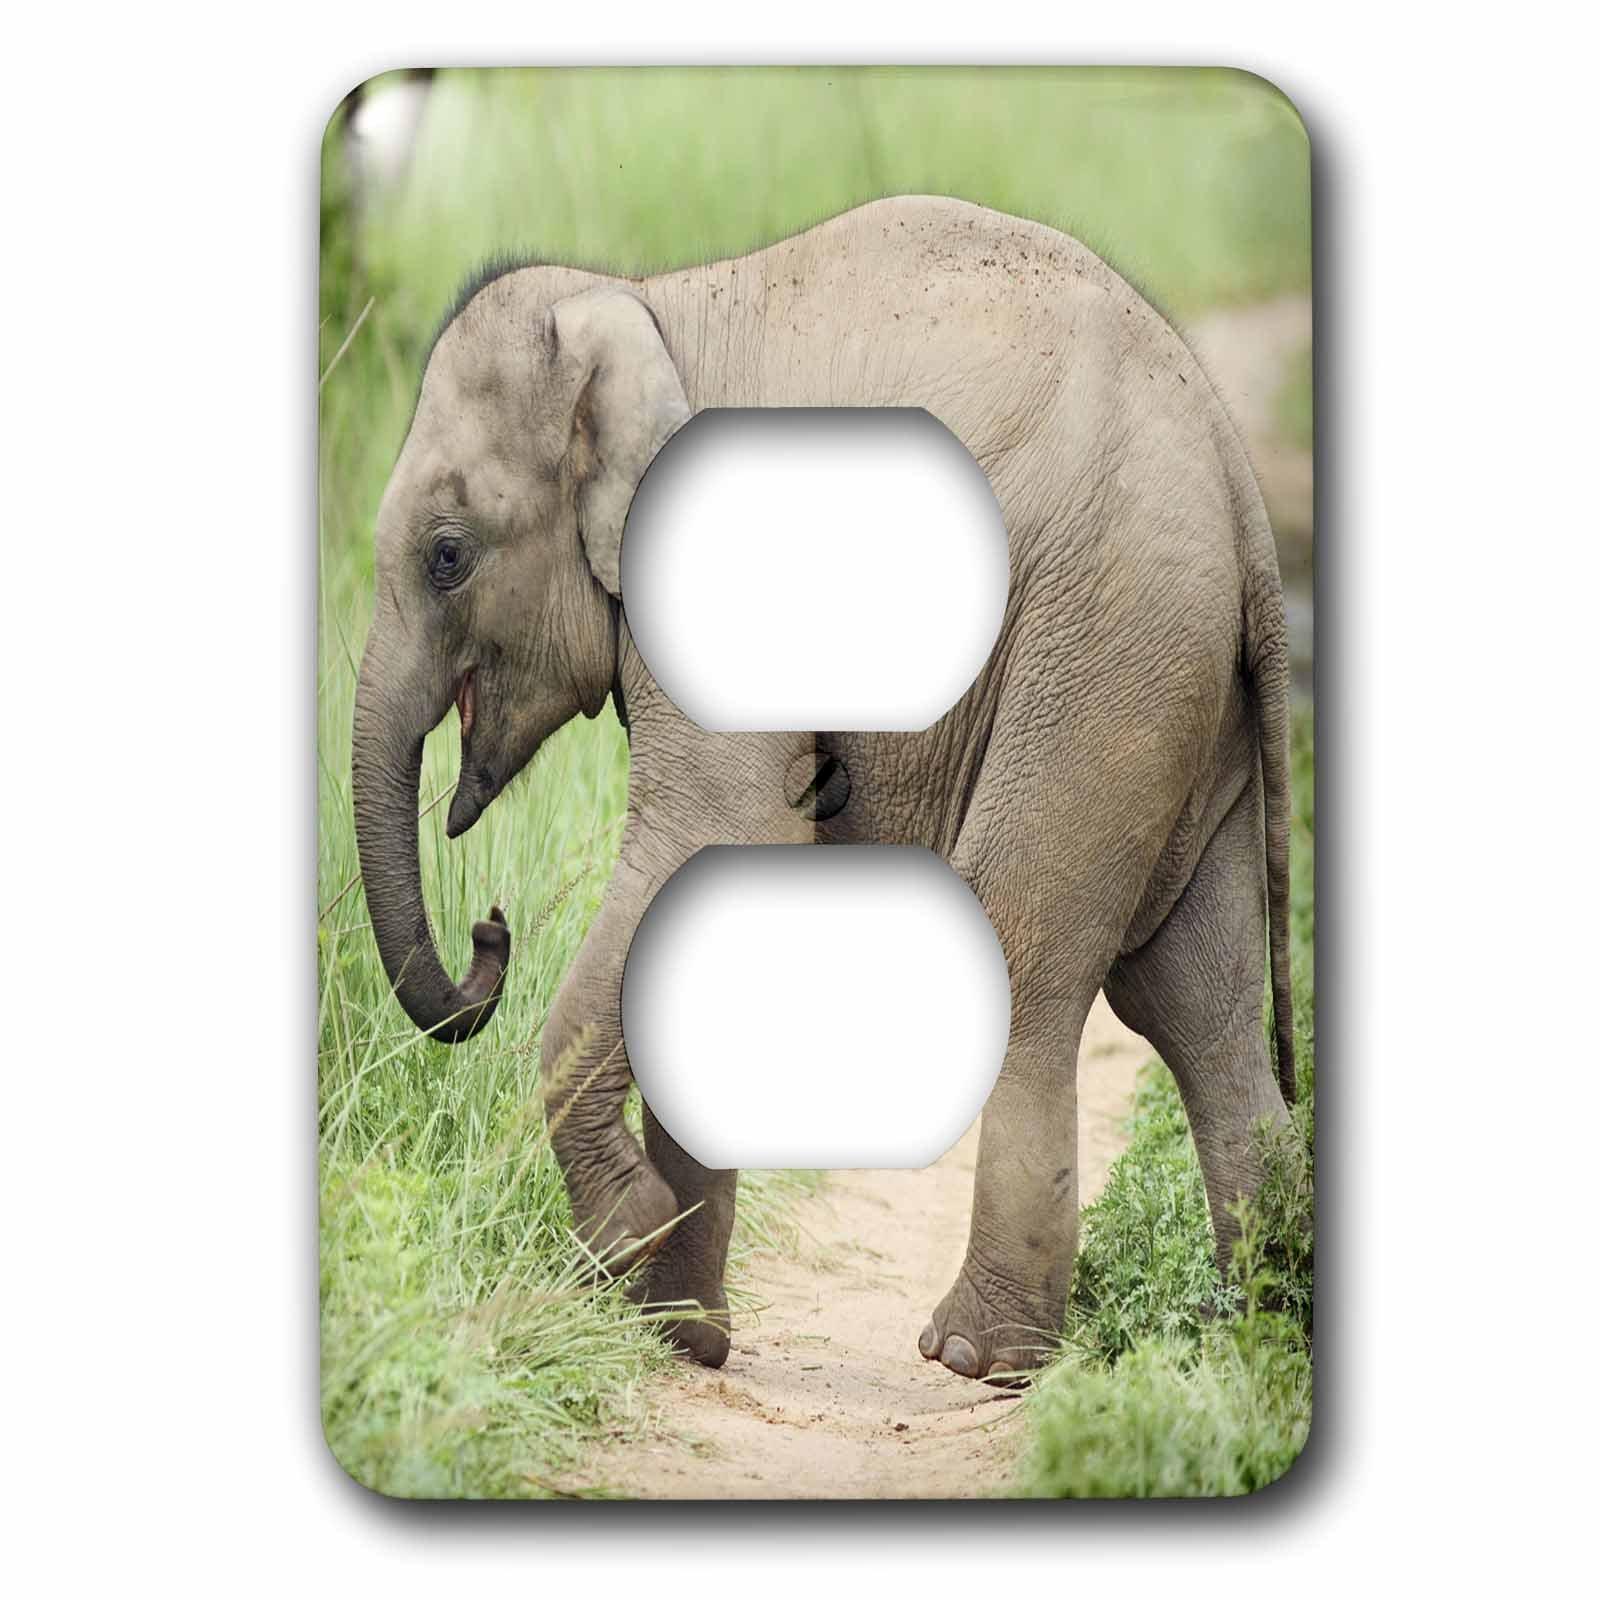 3dRose lsp_71687_6 Baby Elephant, Mother, Corbett National Park, India-As10 Jra0424 Jagdeep Rajput 2 Plug Outlet Cover